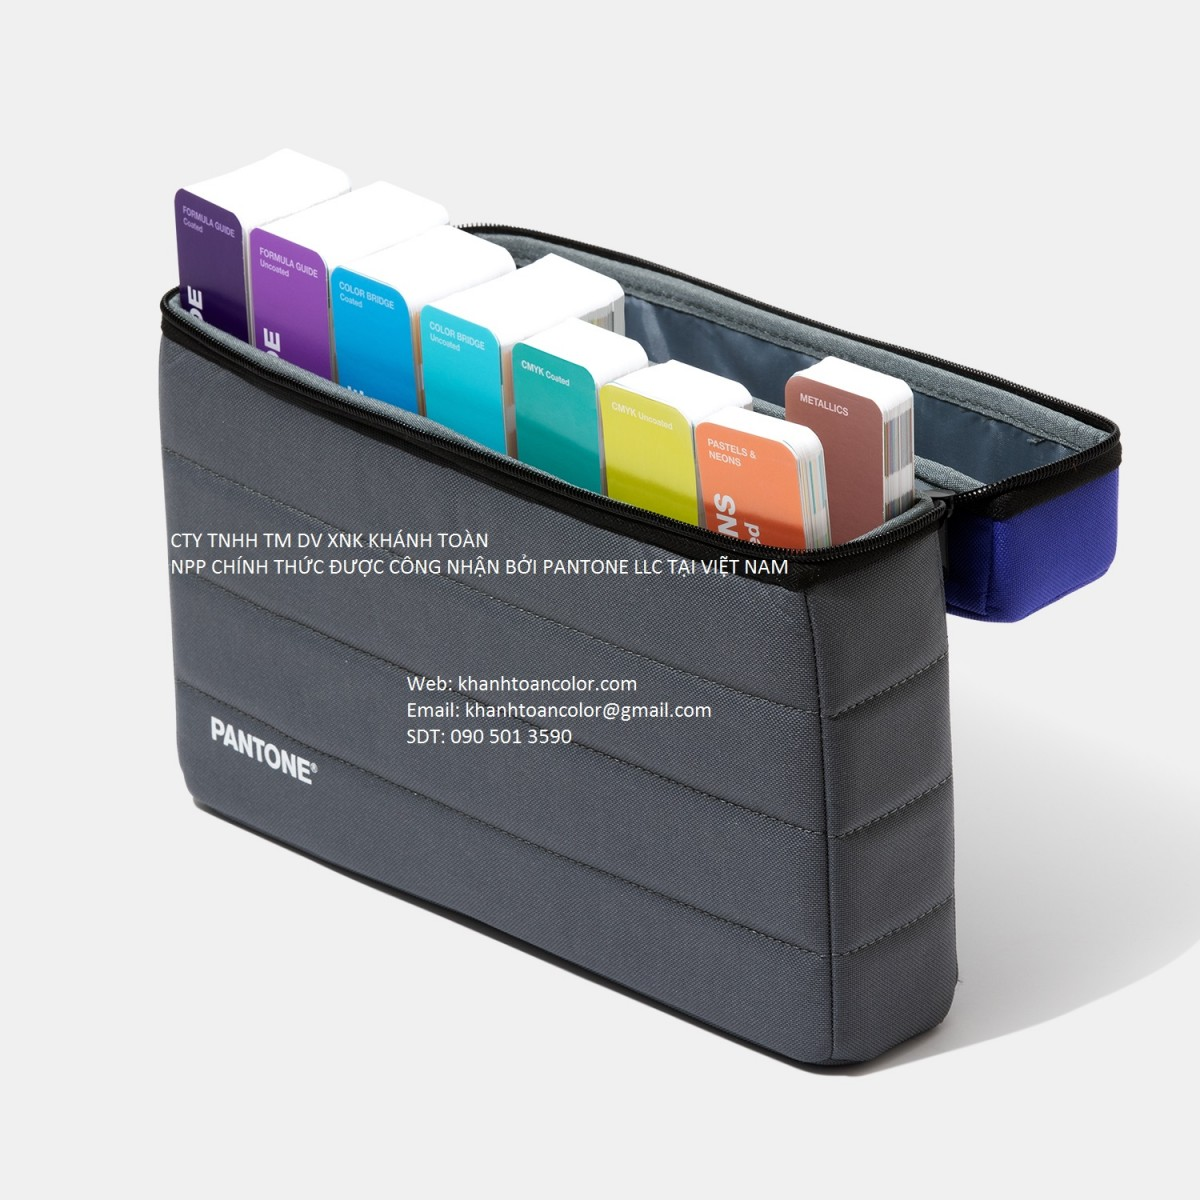 Pantone C U Portable Studio GPG304A năm 2020